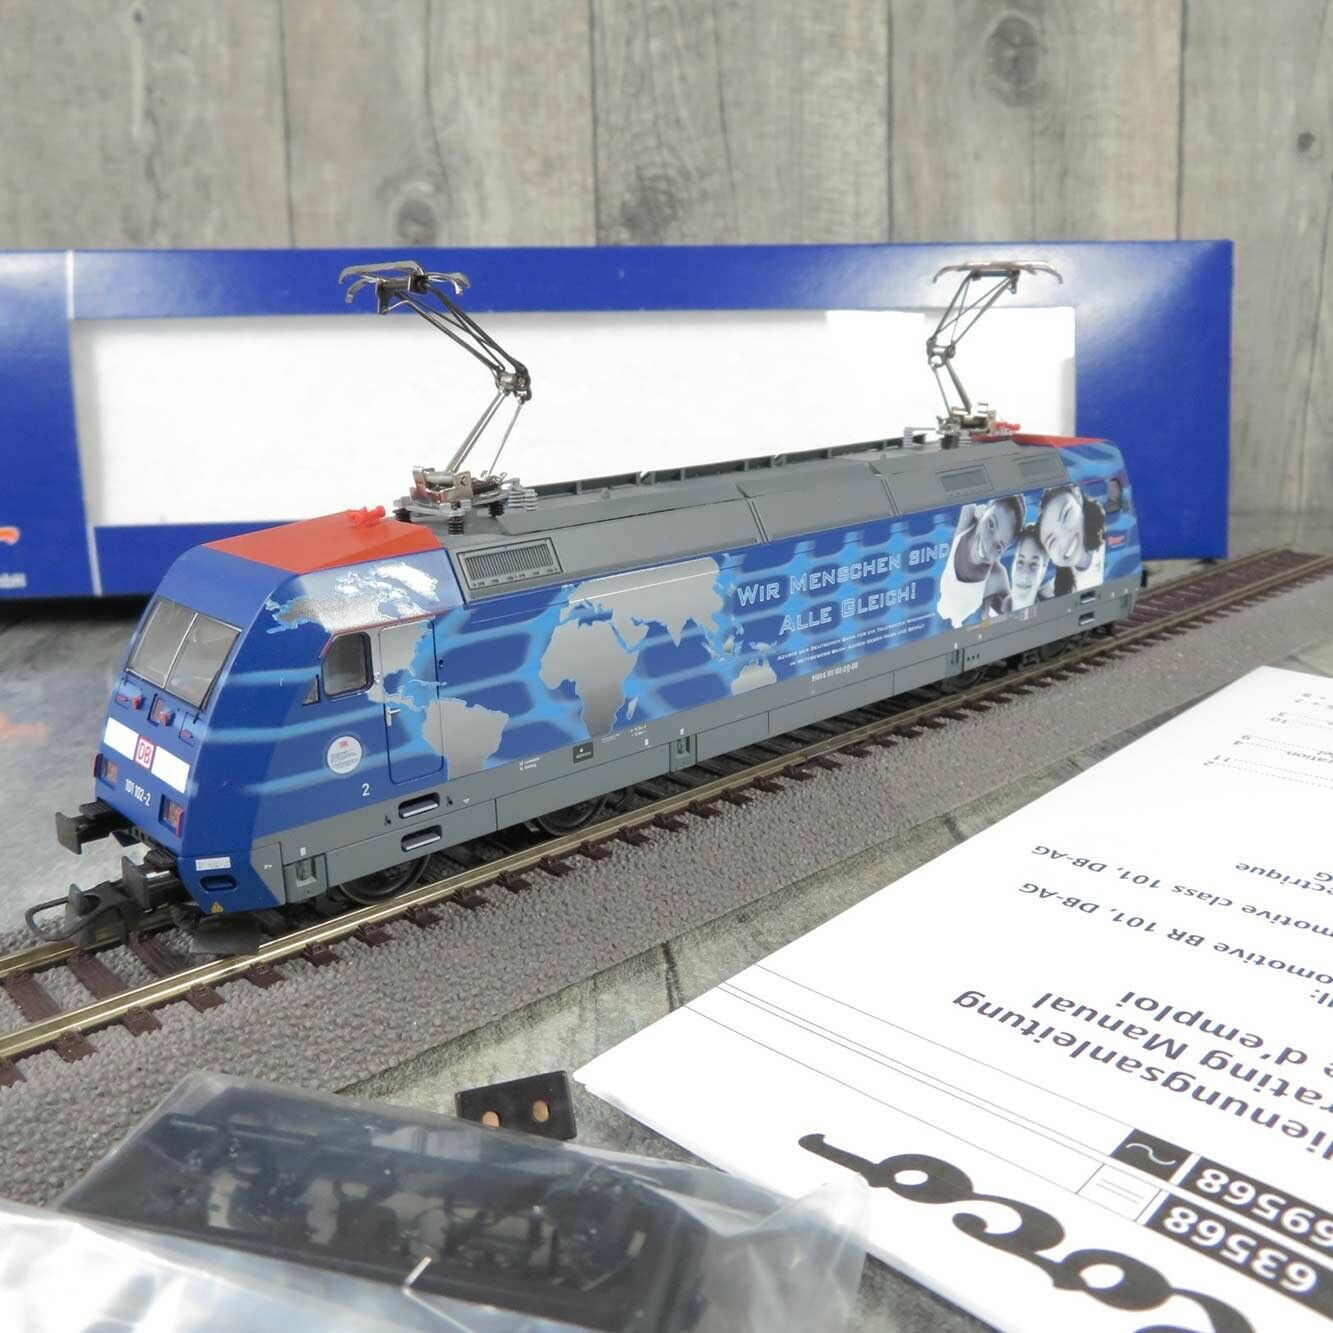 ROCO 63568 - H0 - E-Lok - DBAG 101 102-2 - Digital - OVP -  F22725